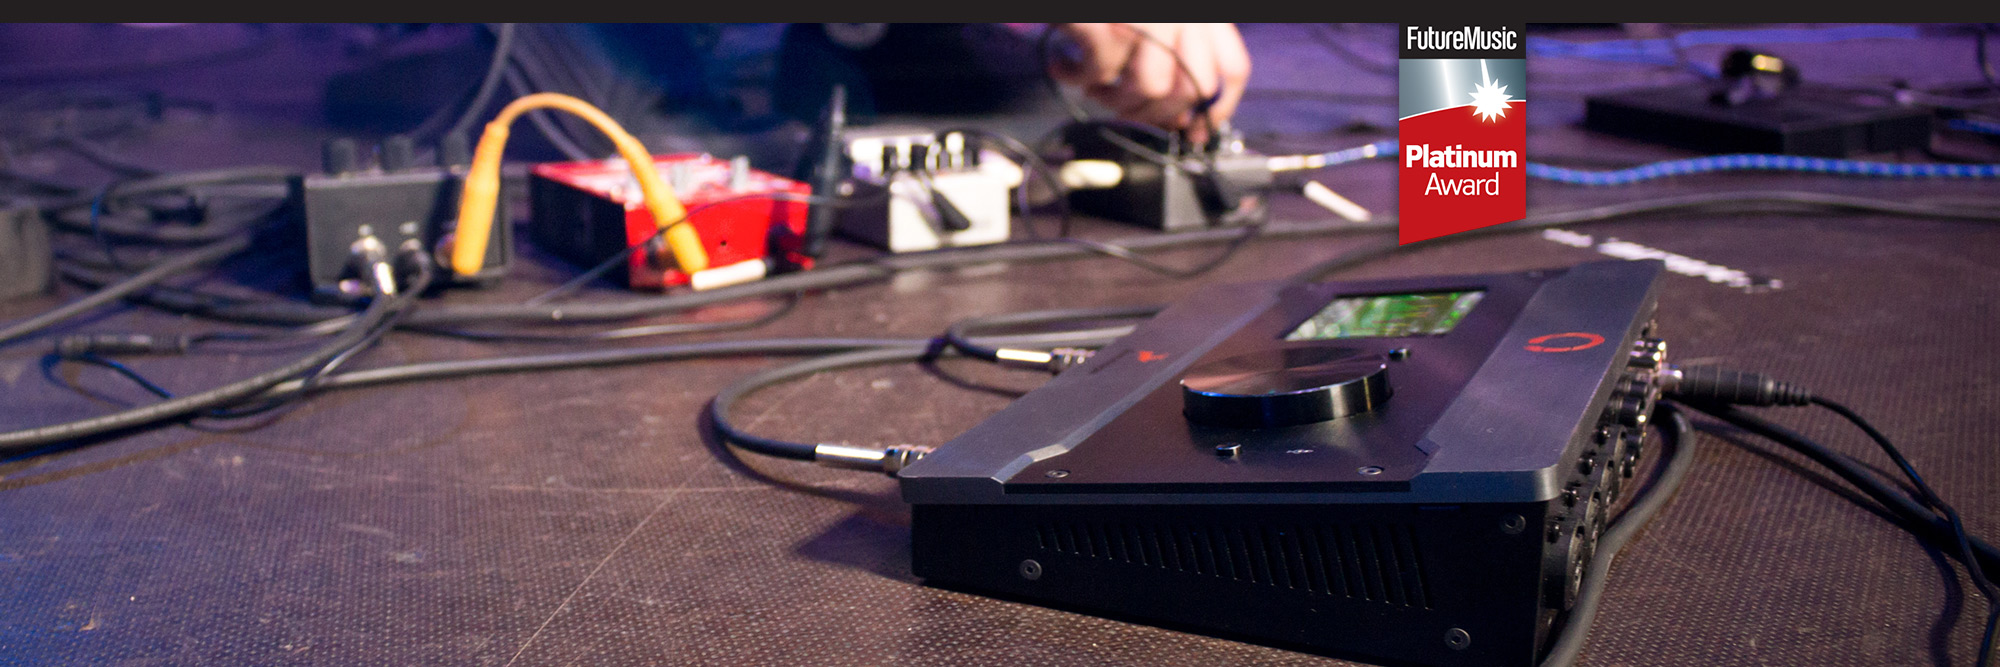 Studio Talks – London Bass Festival